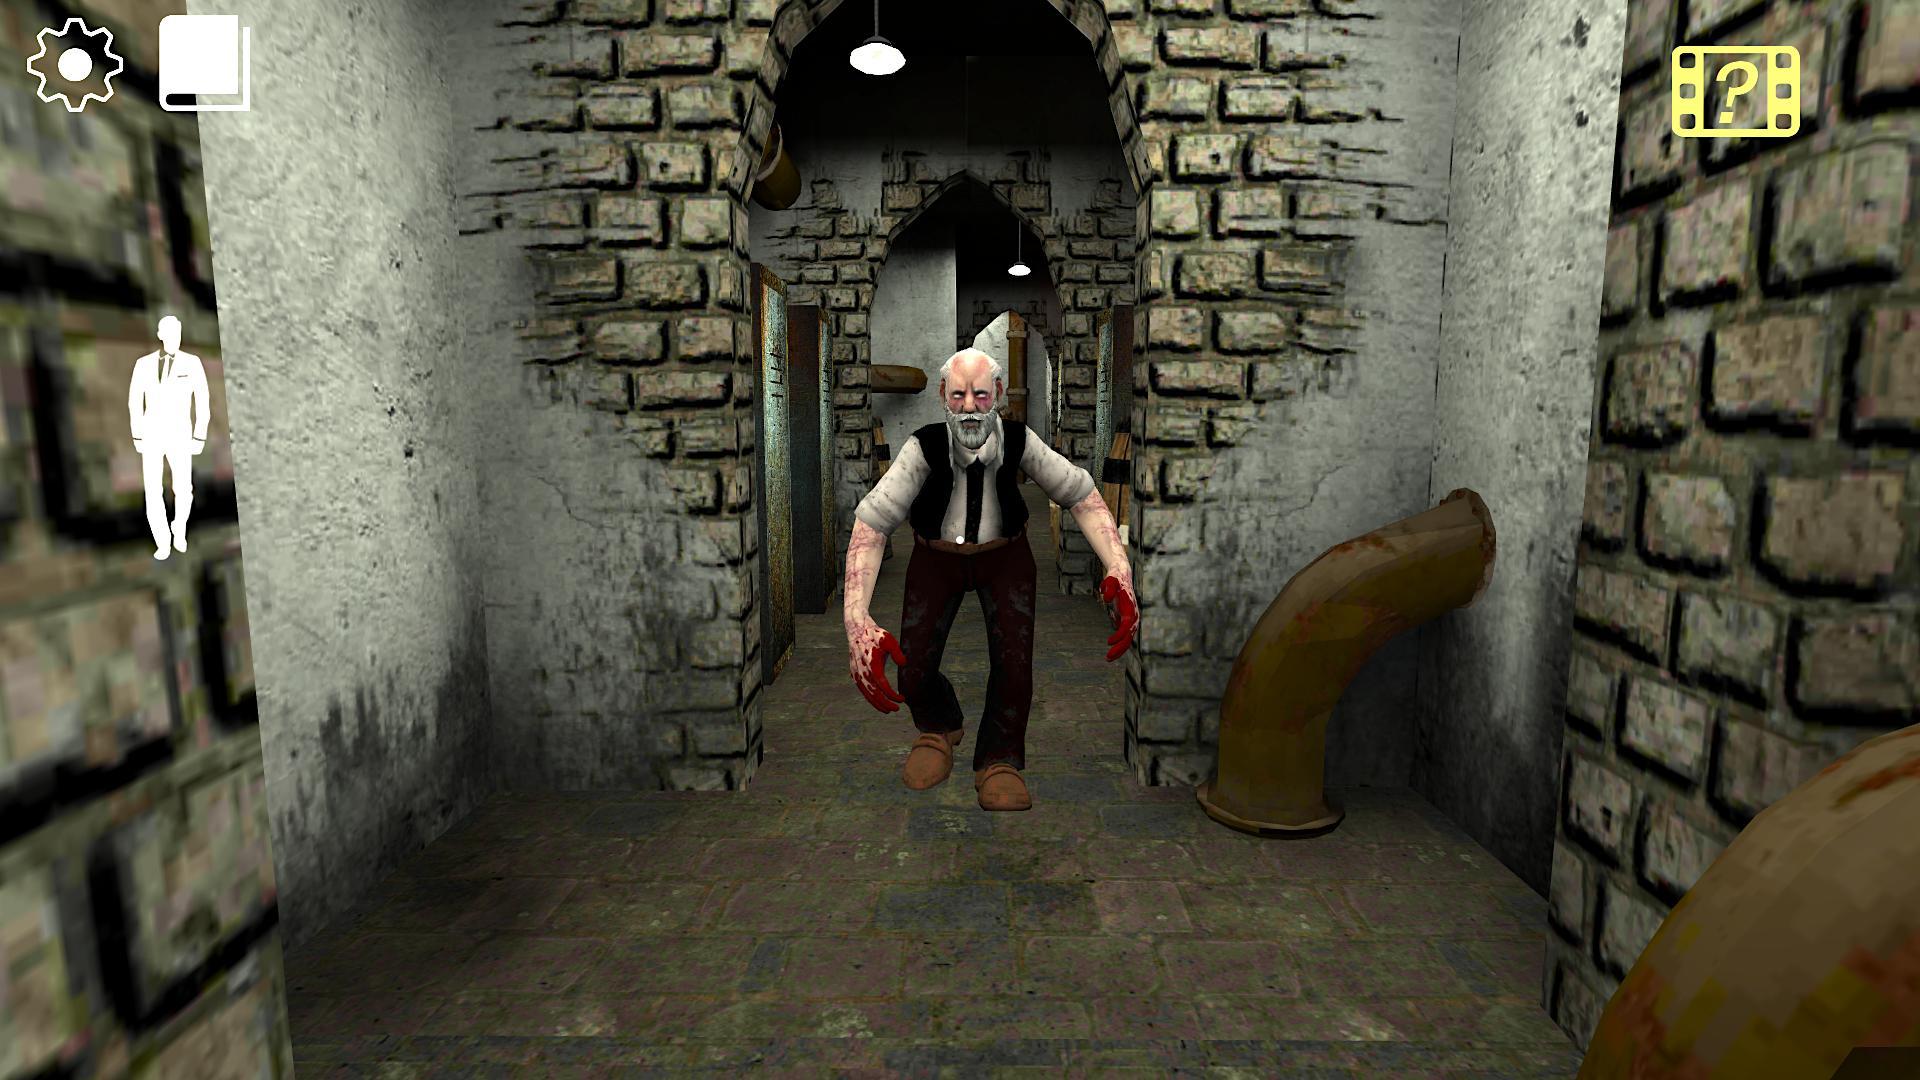 Evil Erich Sann : The New Horror Games. 2.5.0 Screenshot 2